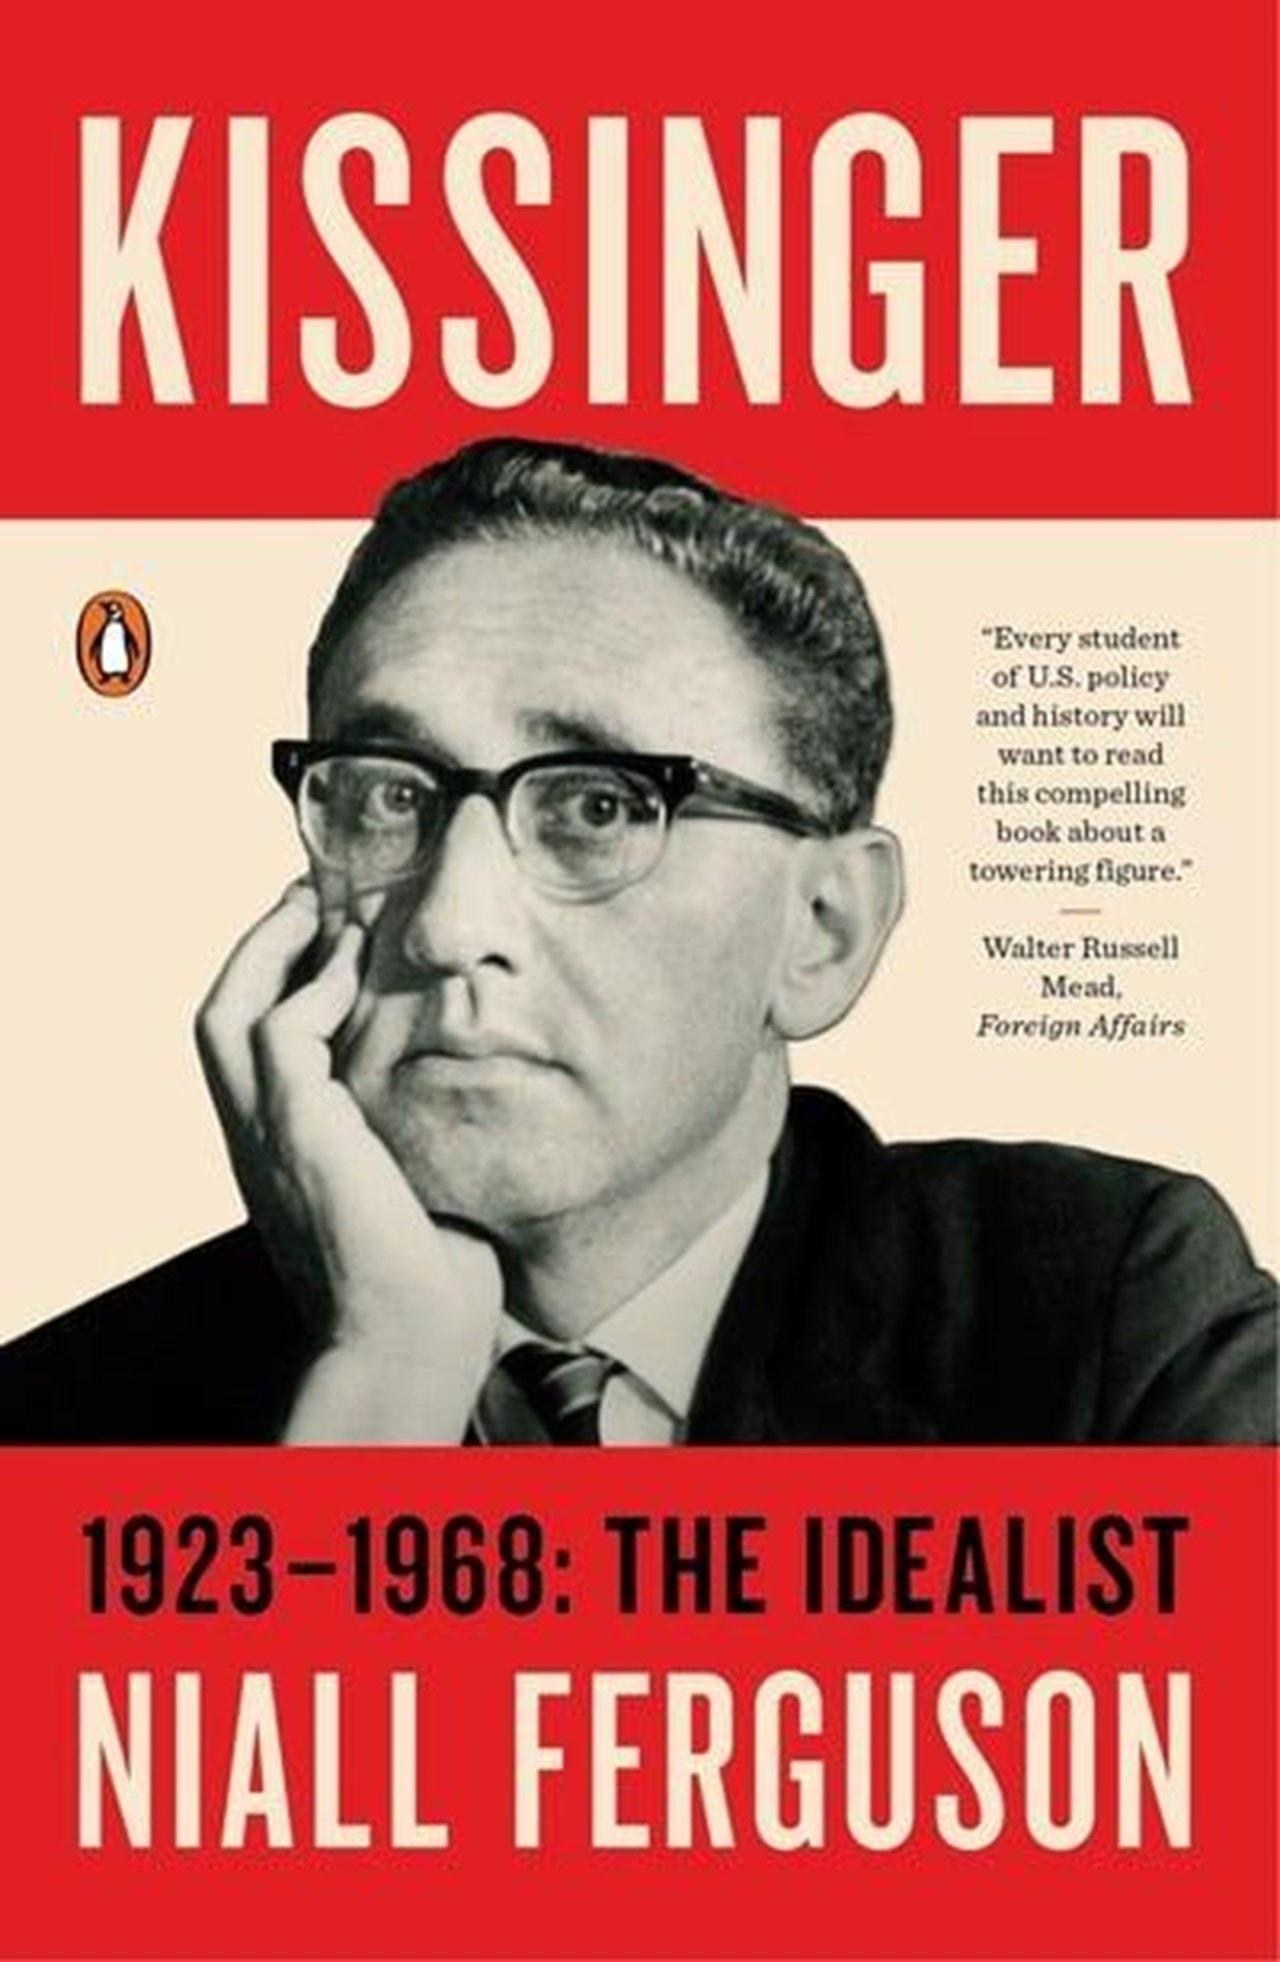 Kissingger: 1923-1968 - The Idealist - 1